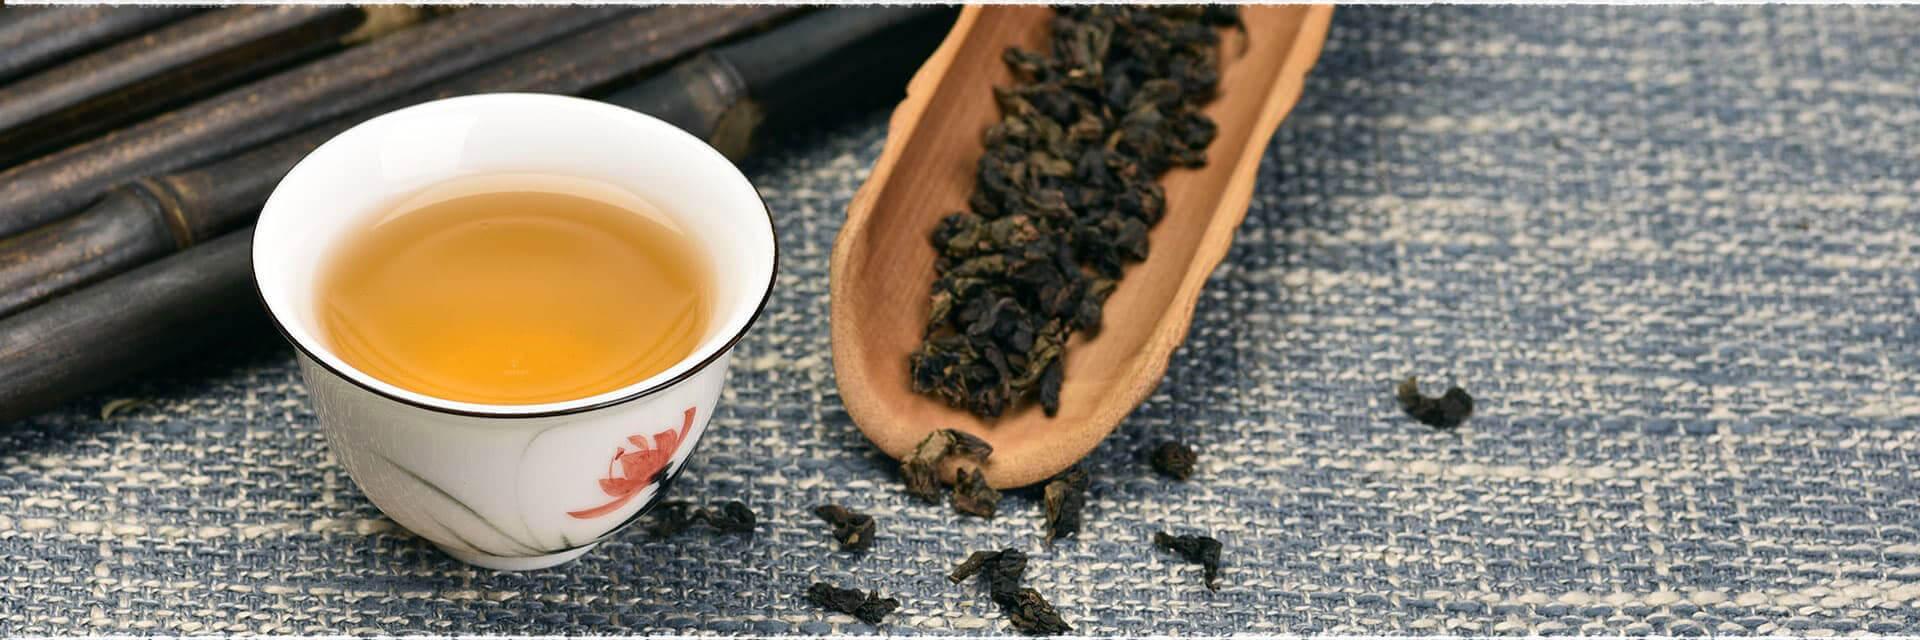 Fermentation of Teas